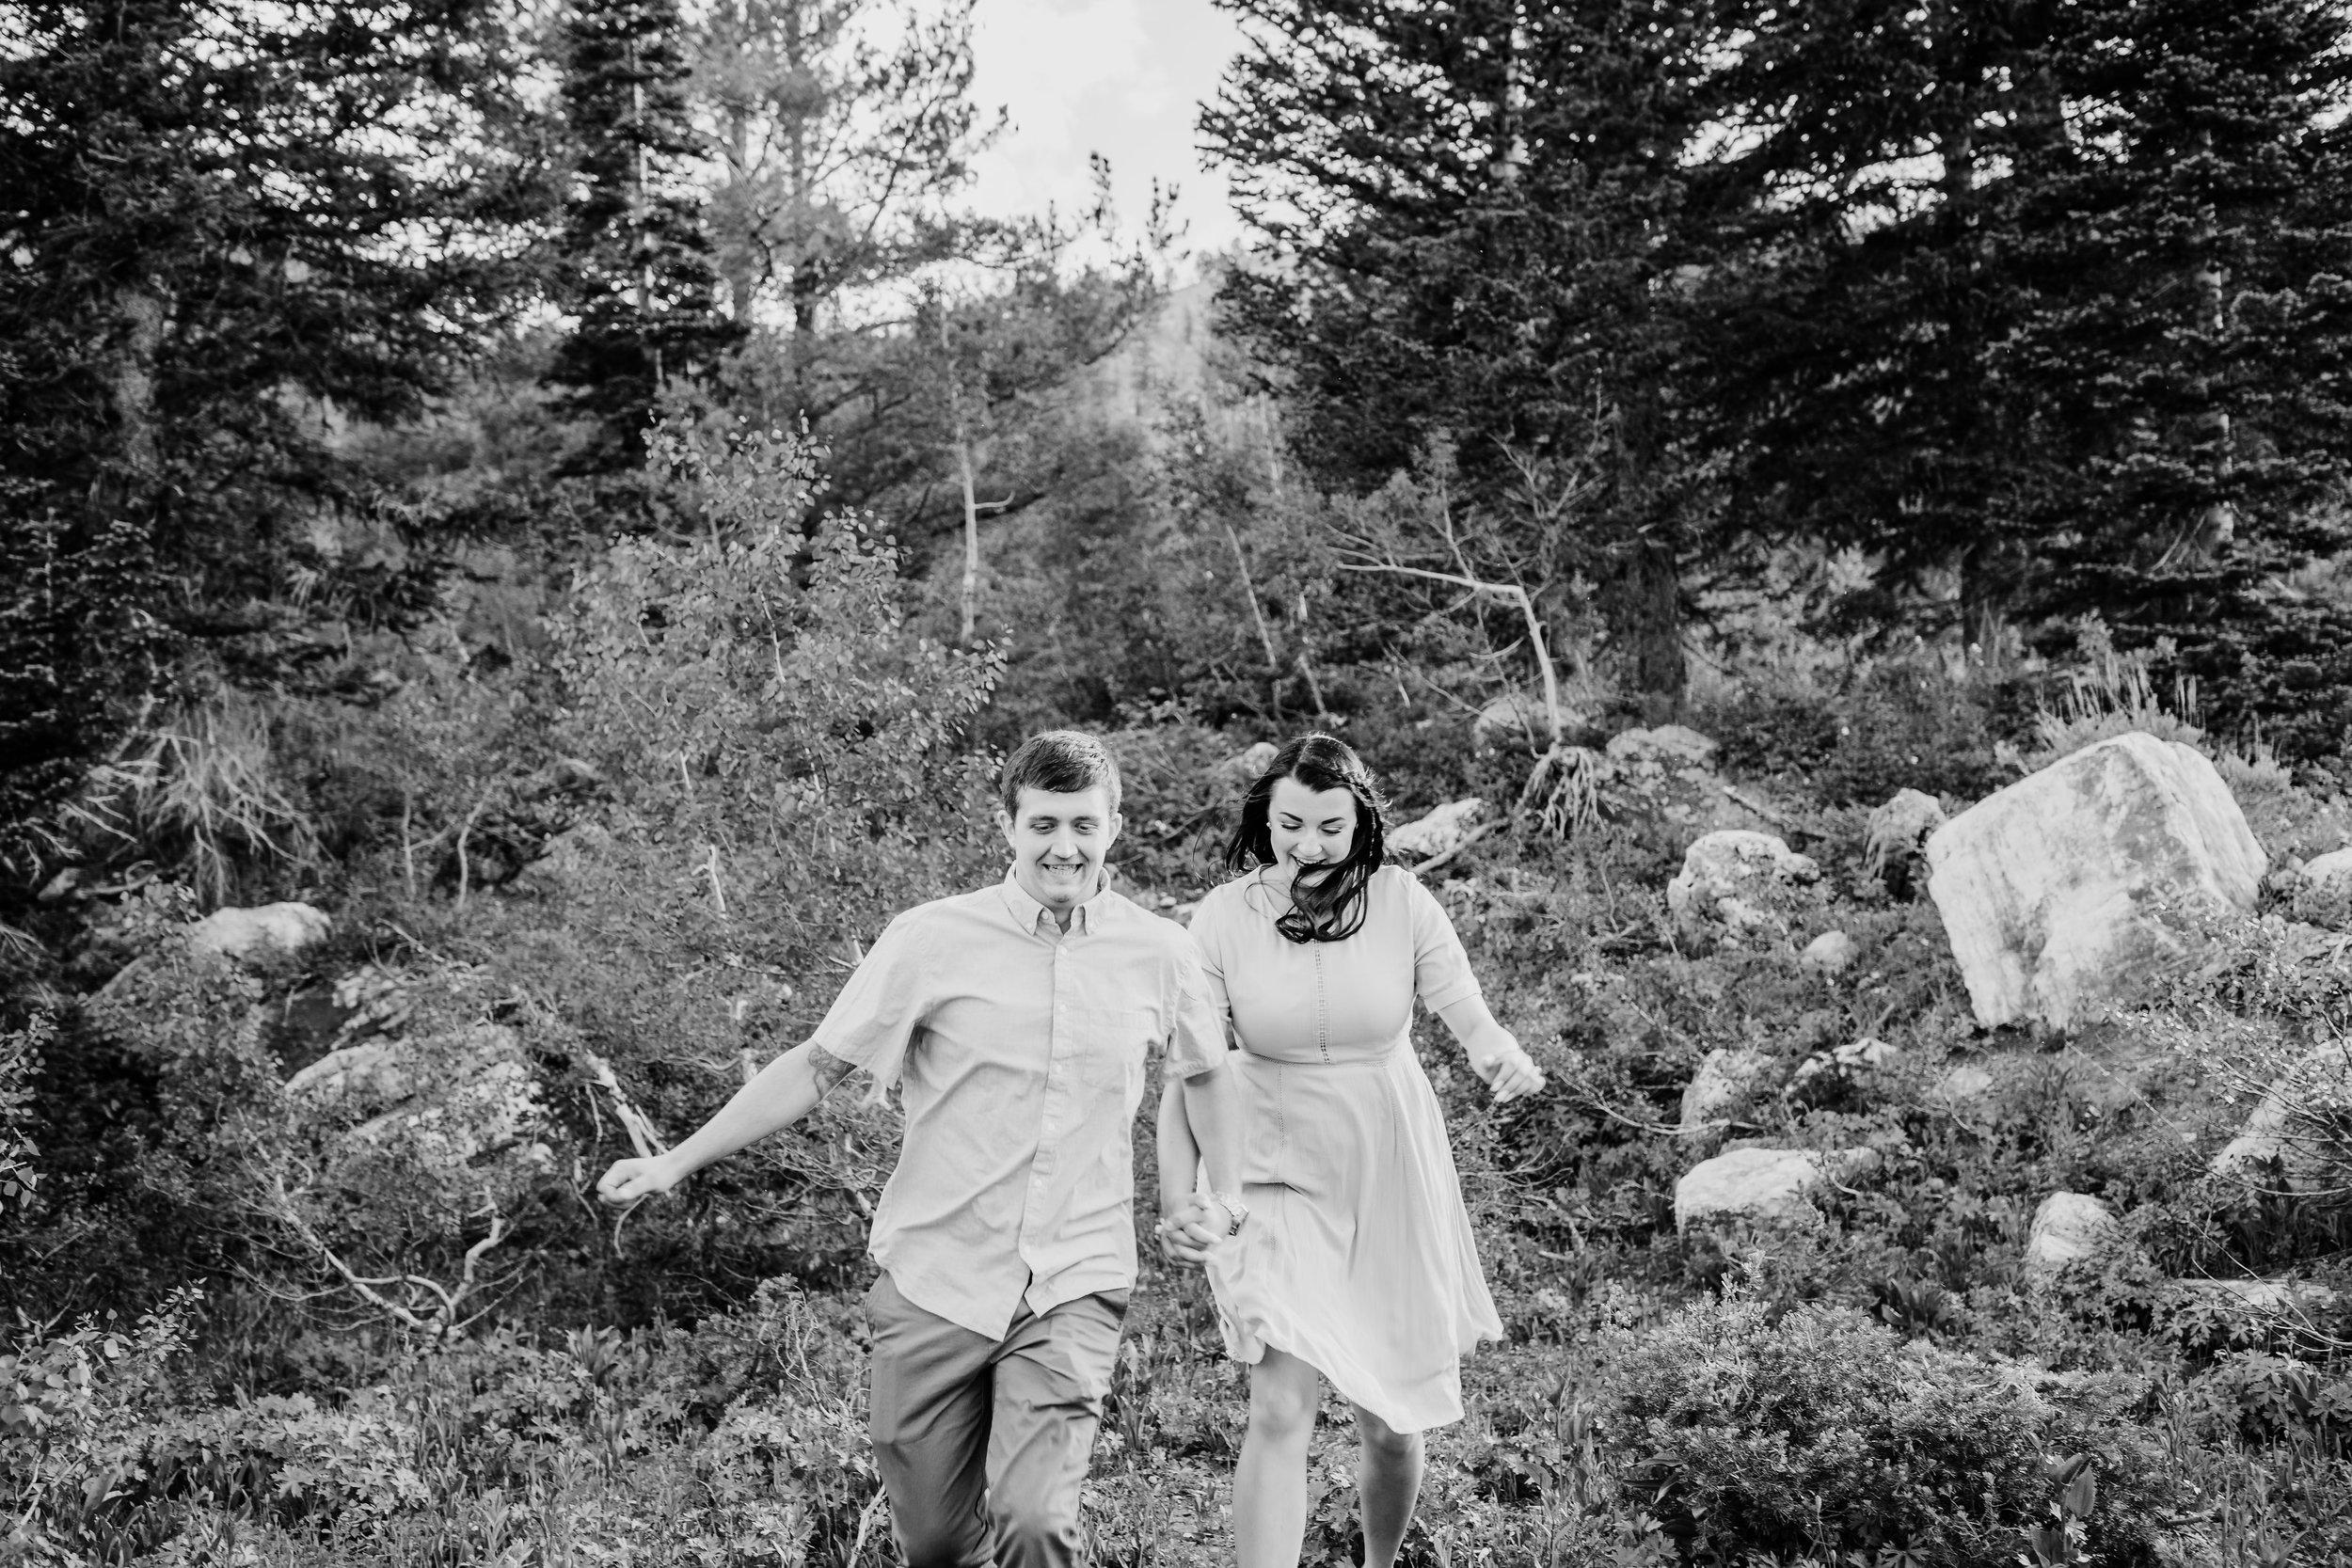 professional engagement photographer in logan utah running mountain engagement holding hands laughing